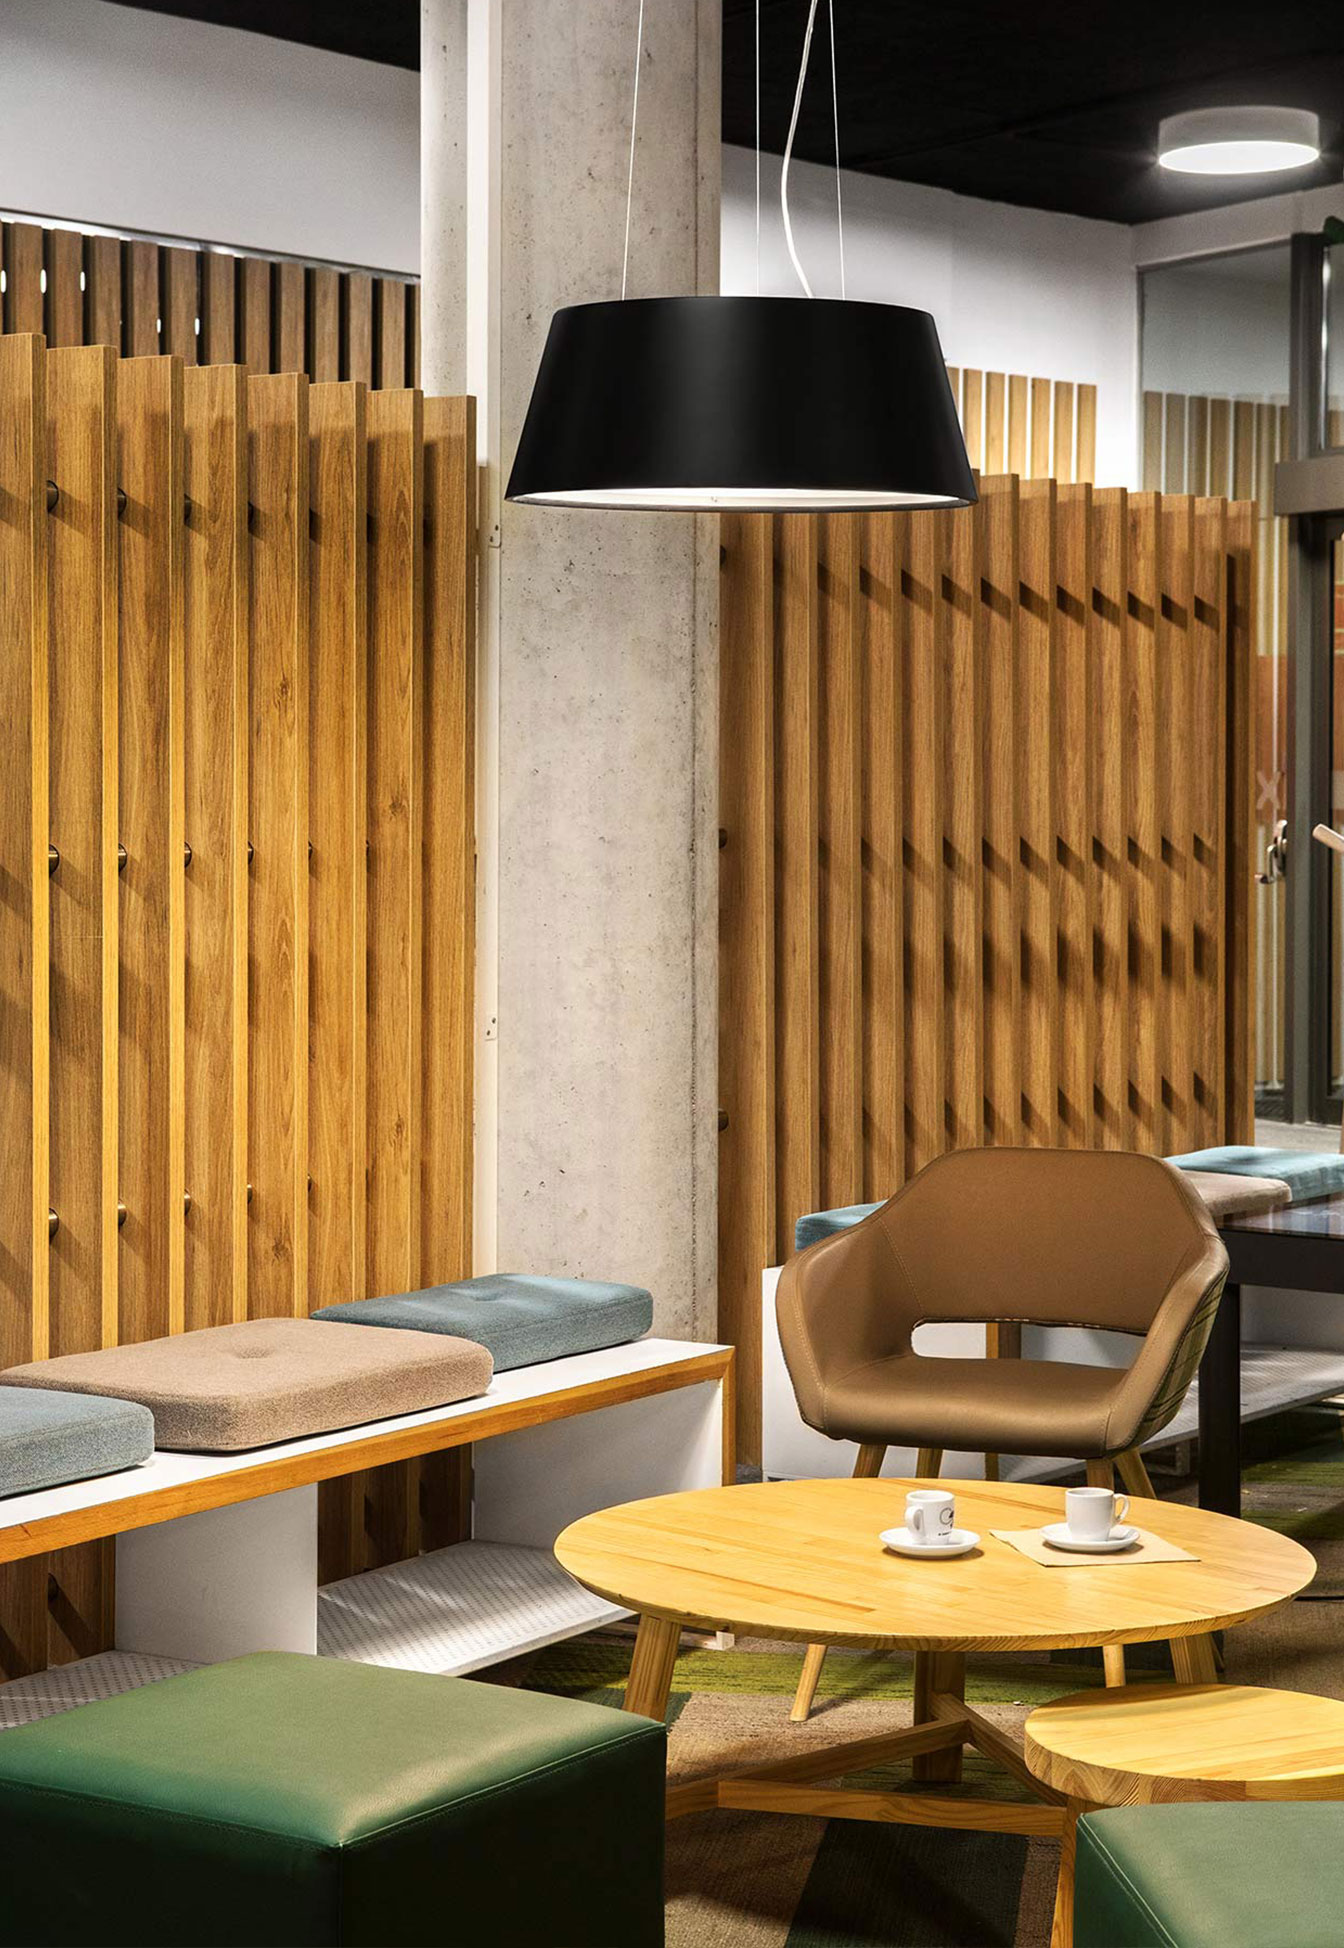 Hall Lounge en Grandvalira, Andorra - Rosa Colet